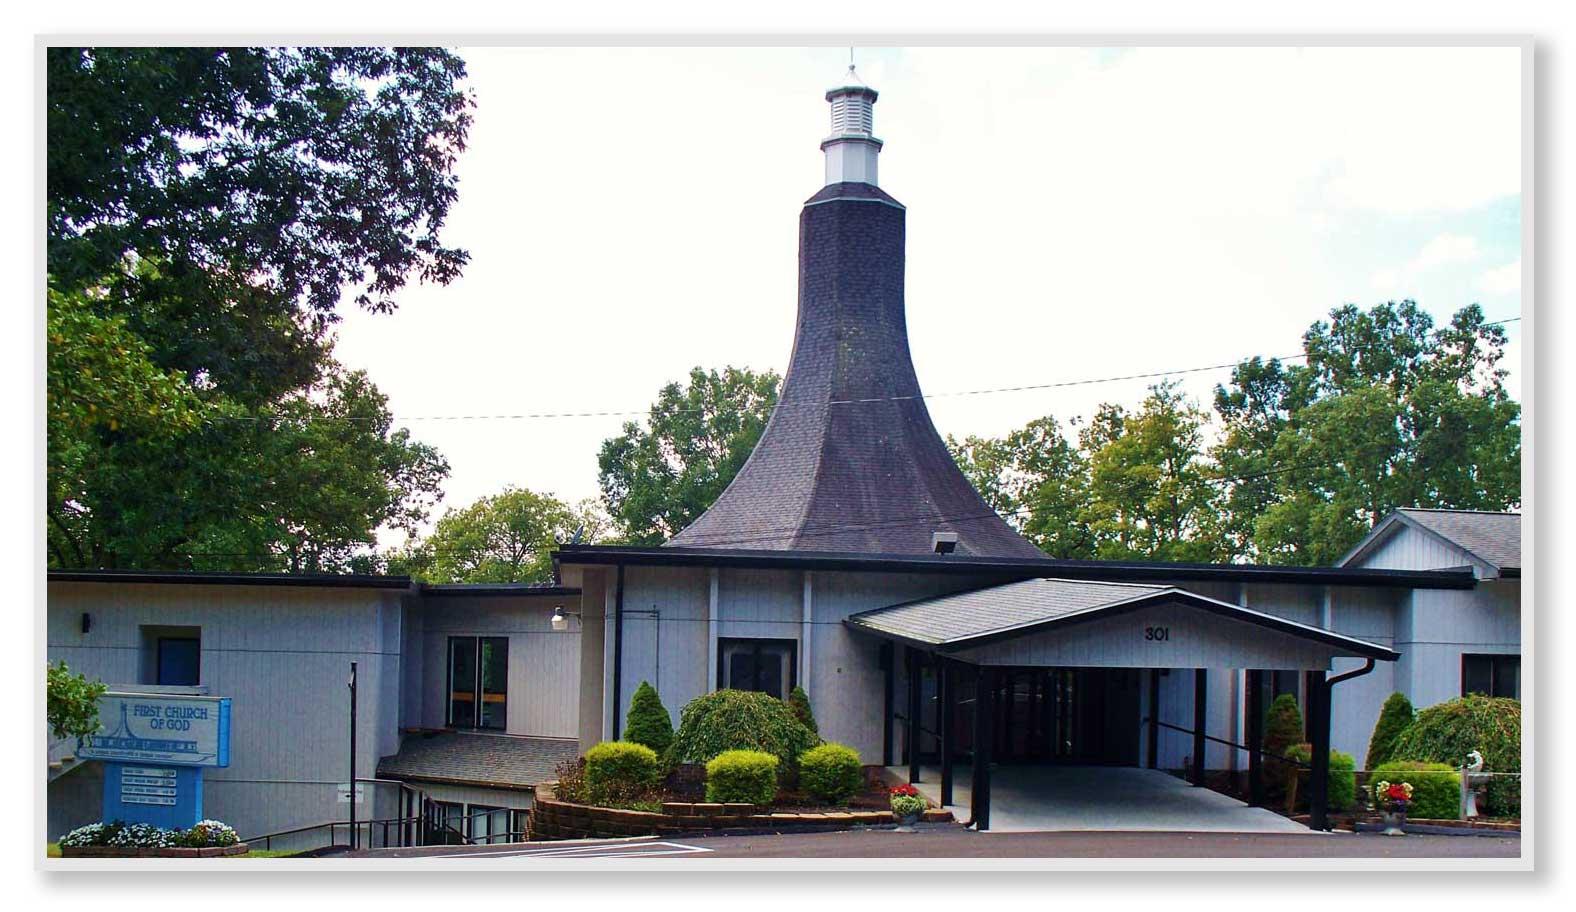 First Church of God, God, Church, Princeton, WV, West Virginia, faith, spiritual, bible, learning, testimonials, worship, fellowship